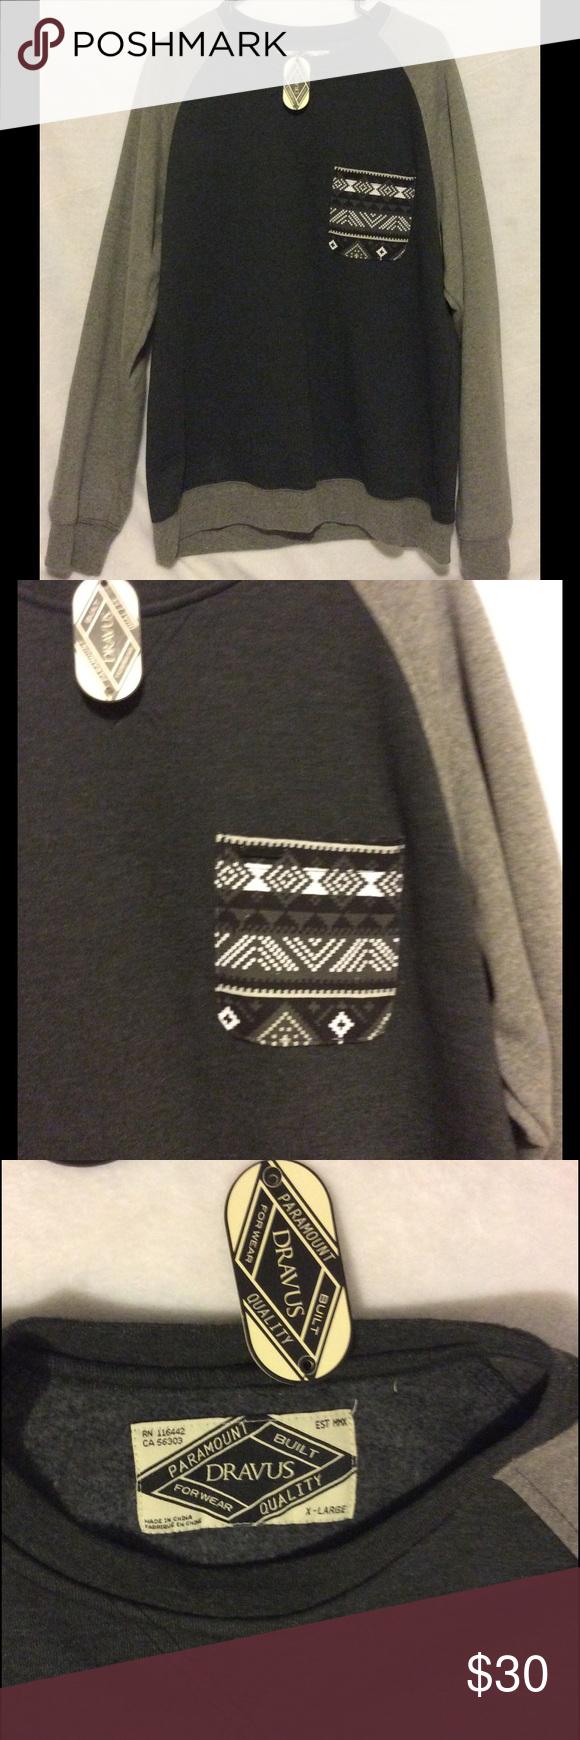 Menus dravus pocket crew sweatshirt crew sweatshirts pullover and